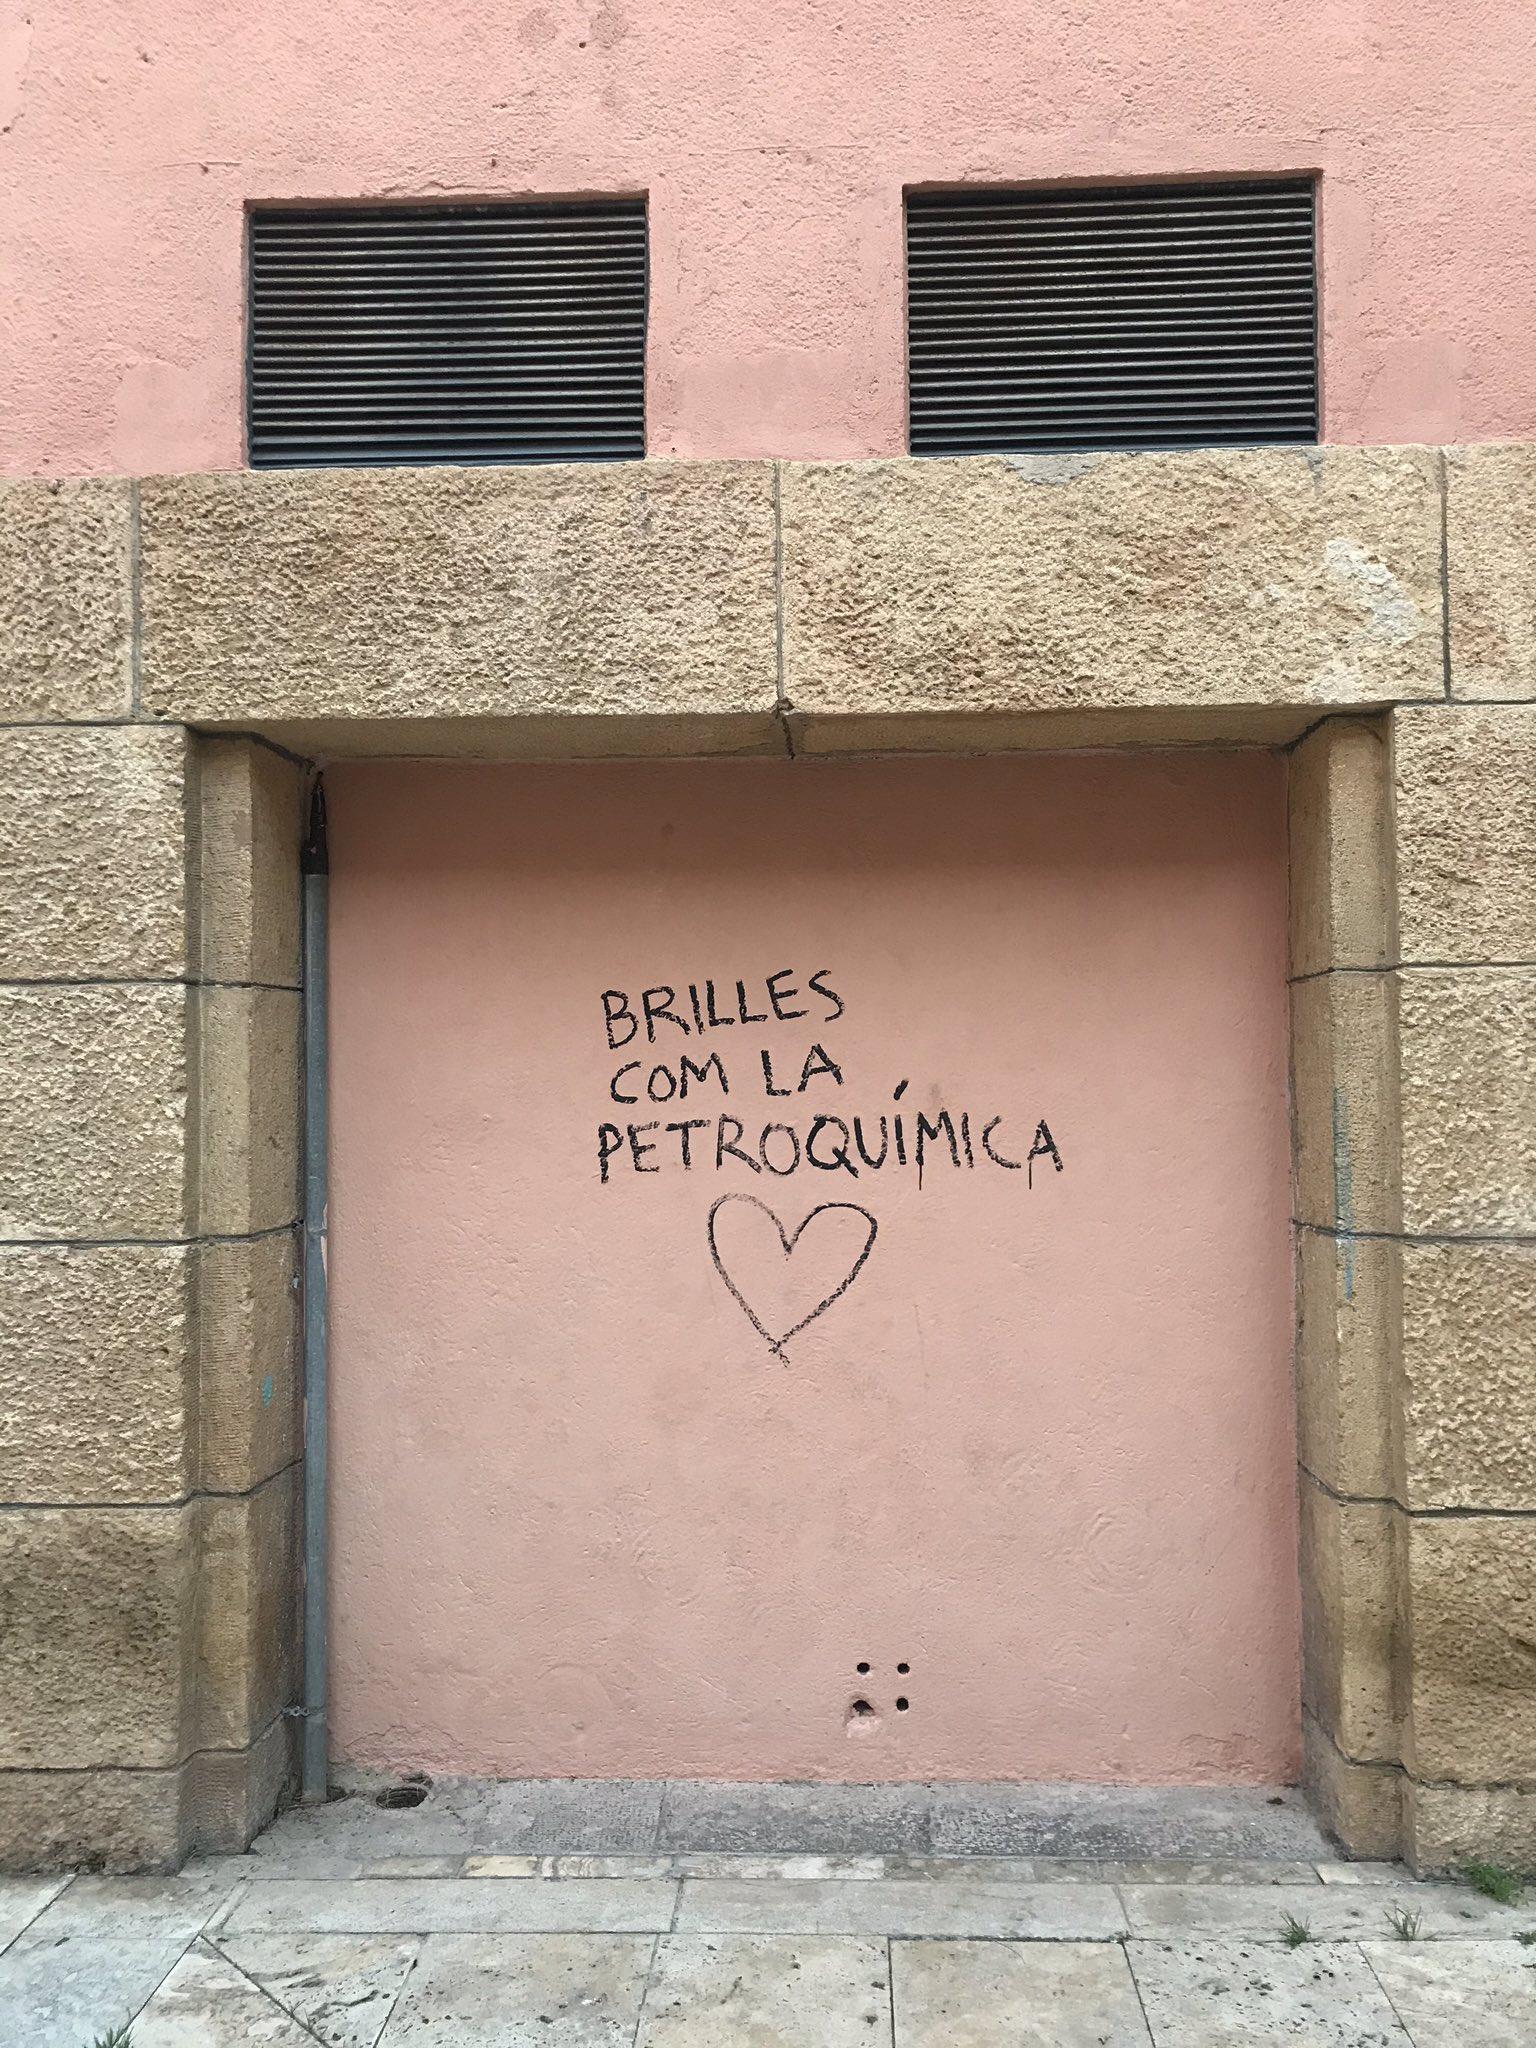 Pintadas, grafittis y otras mierdas del arte hurvano ese. - Página 5 ERhbuV6W4AEPcbR